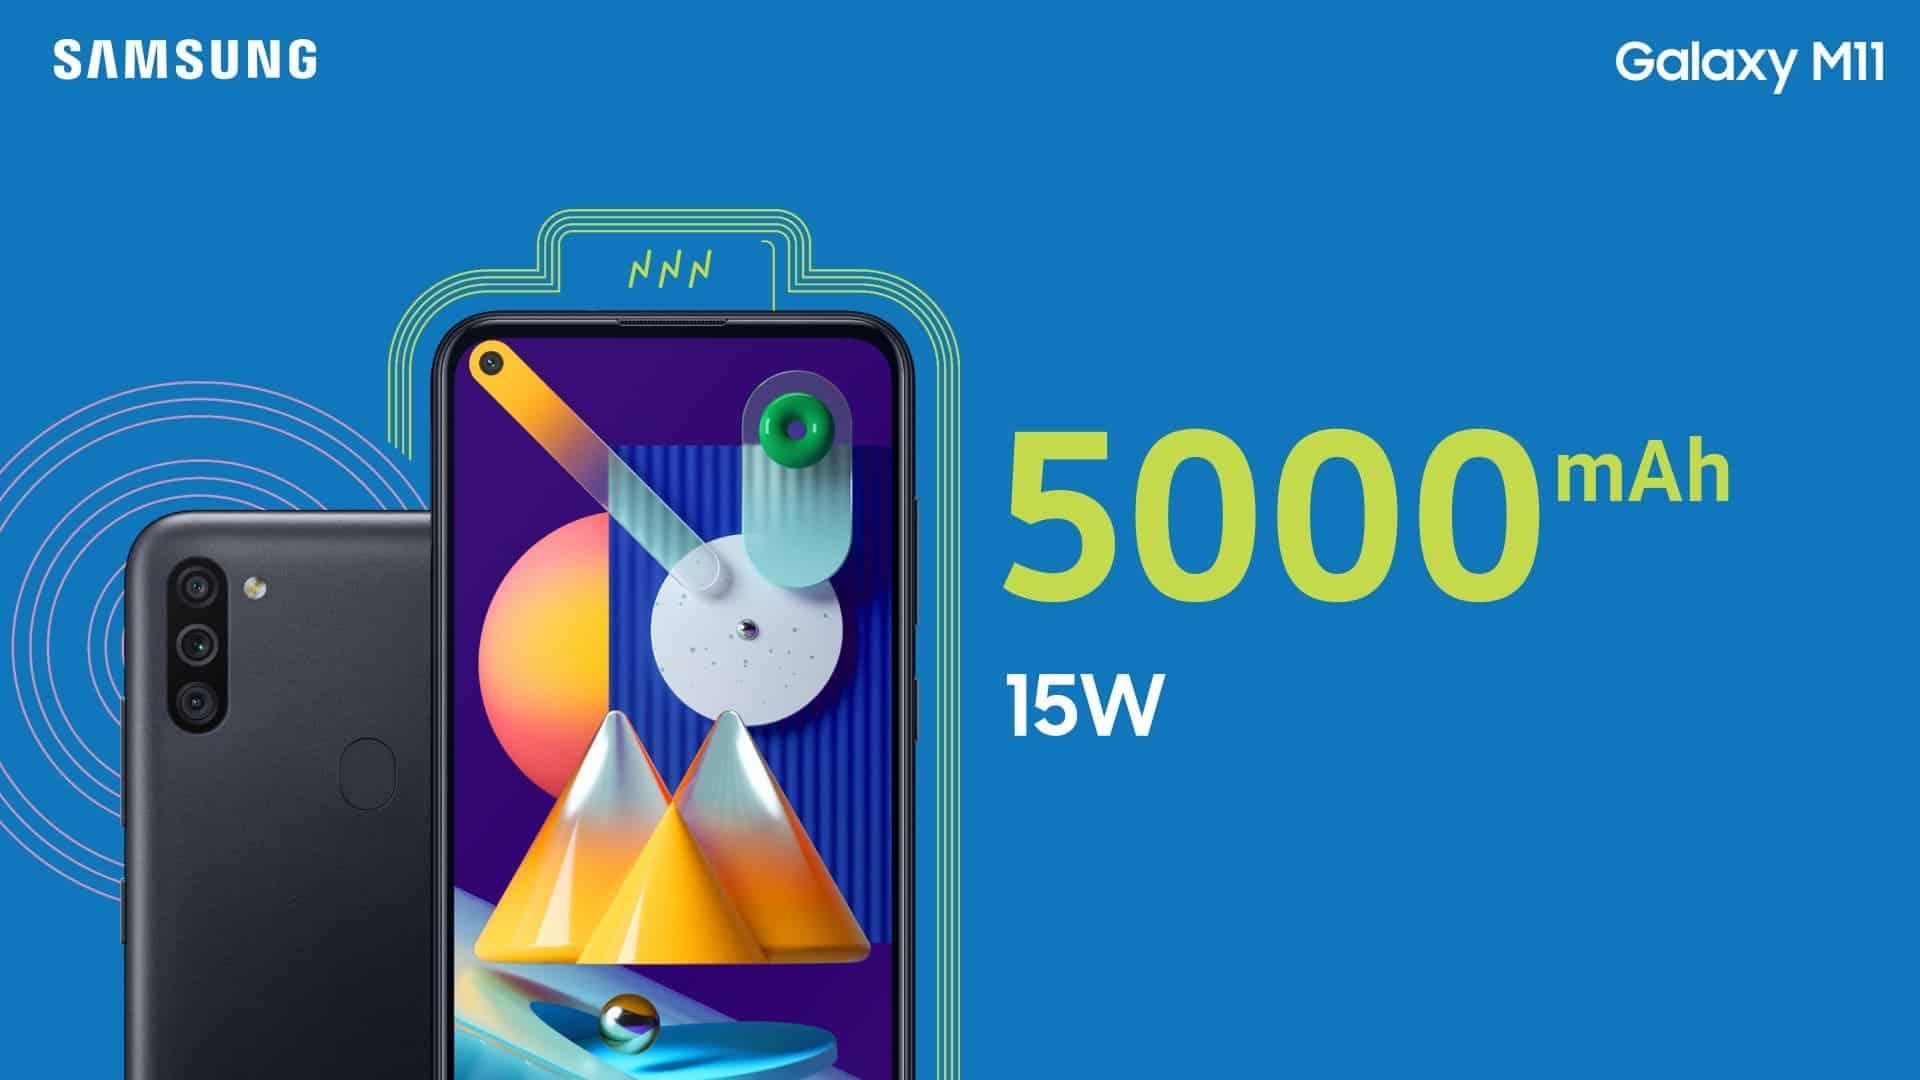 Samsung Galaxy M11 Galaxy M01 Launch In India On June 2 Confirmed By Flipkart Cashify Blog